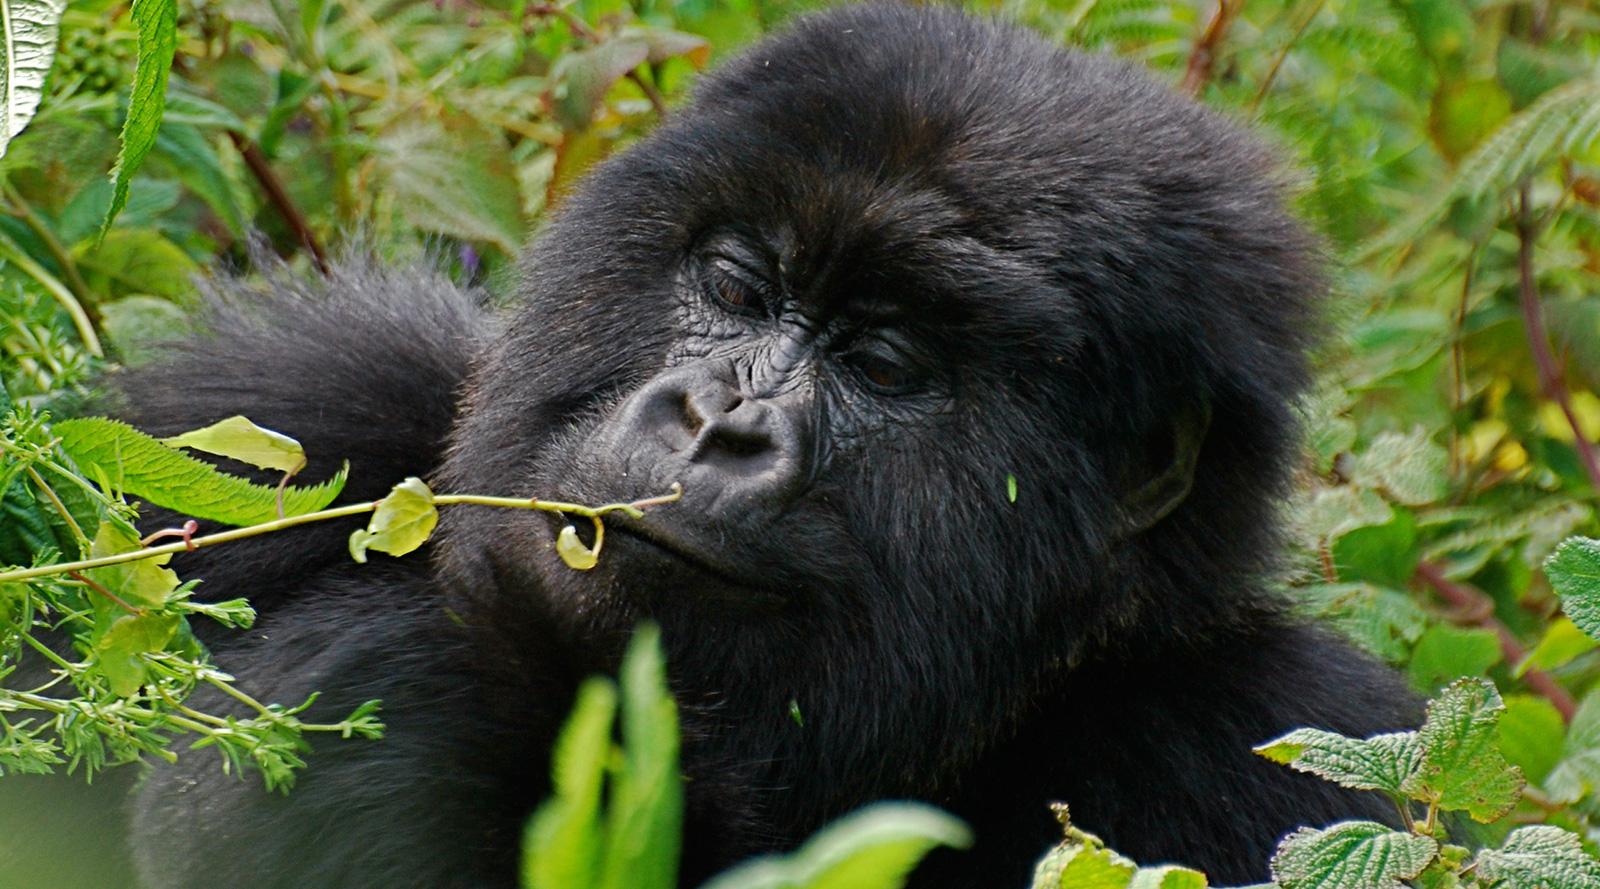 © N. Contos | Rwanda, Volcanoes National Park